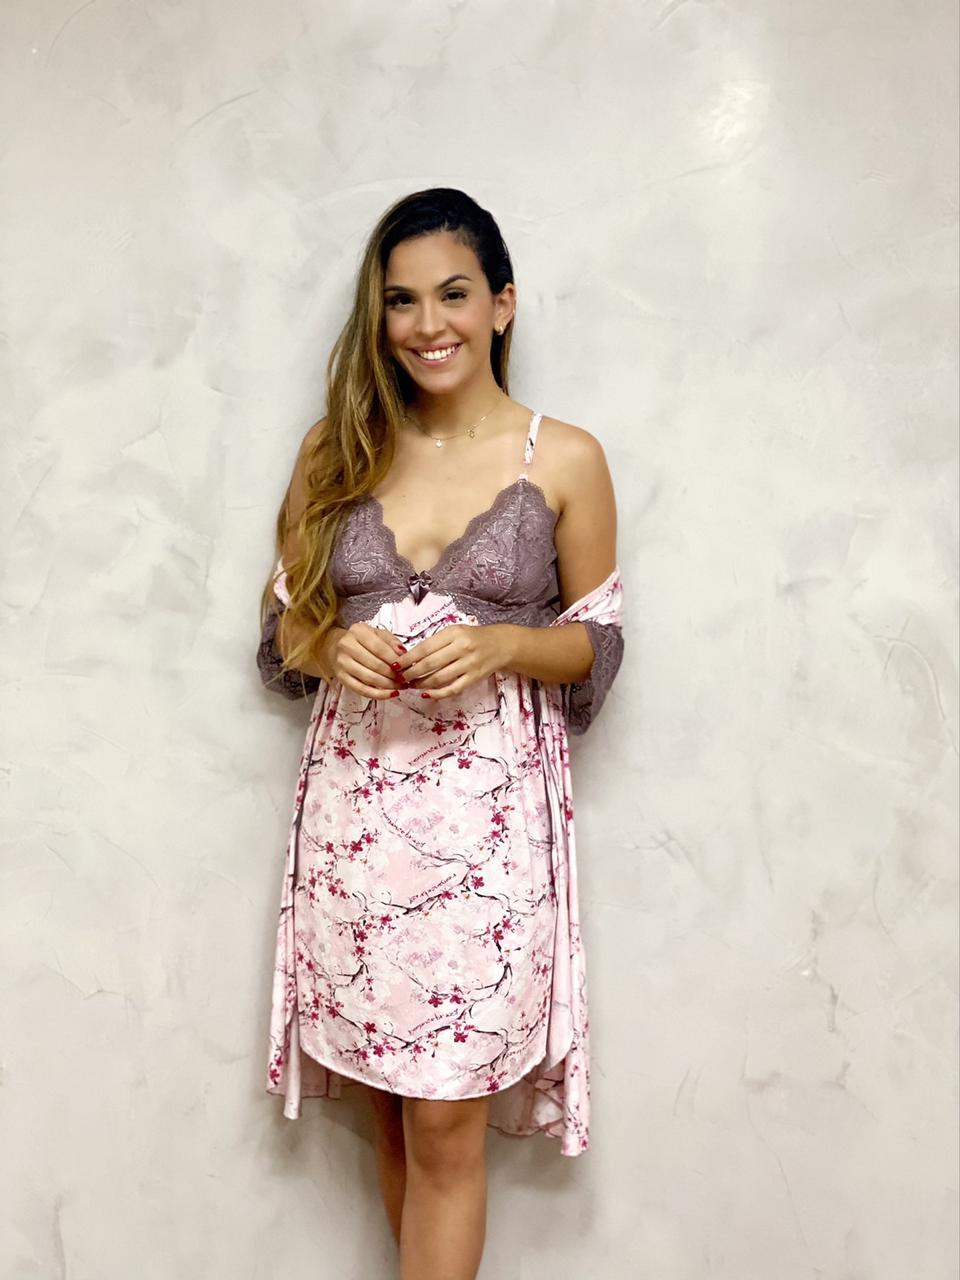 Camisola Amamentação Renda Lavanda   - RMCE BRAZIL